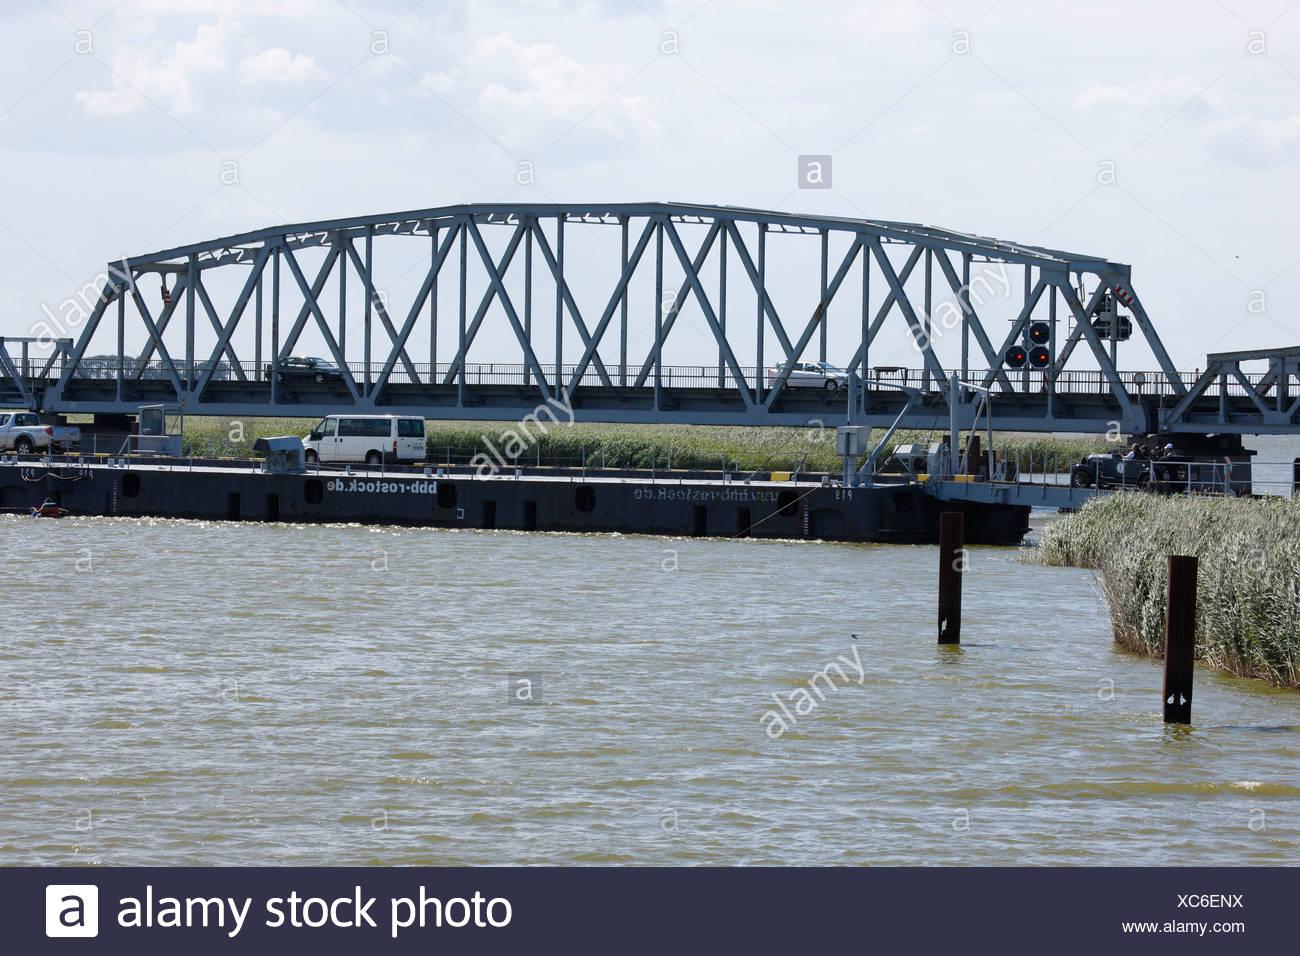 Meiningen Bridge, old railway swingbridge, Bodstedt Bodden, Western Pomerania Lagoon Area National Park, Mecklenburg-Western Po - Stock Image